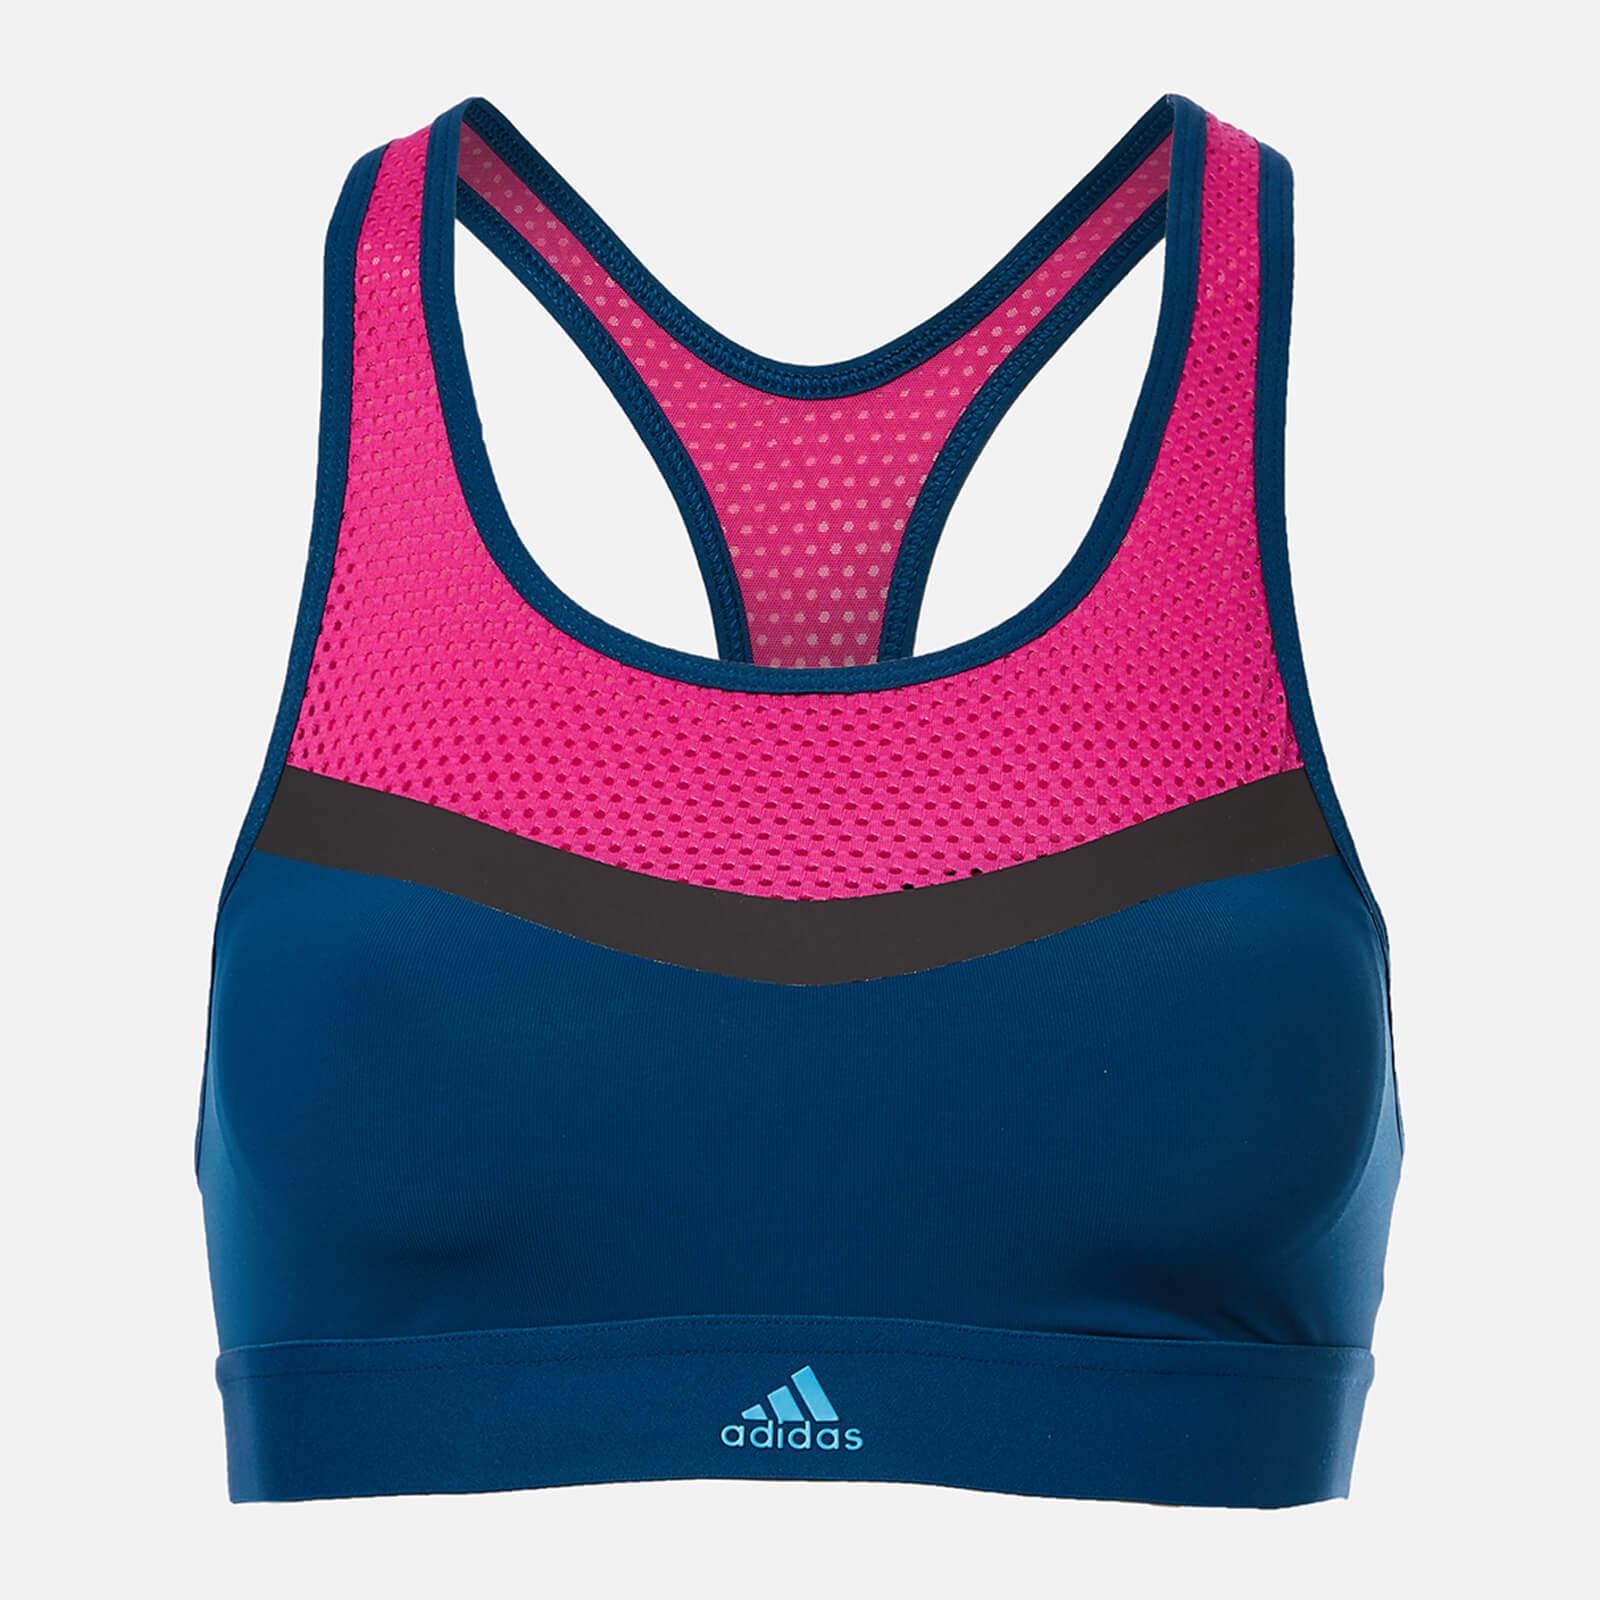 adidas Women's Don't Rest Swim Crop Top - Blue/Pink - 32C - Multi